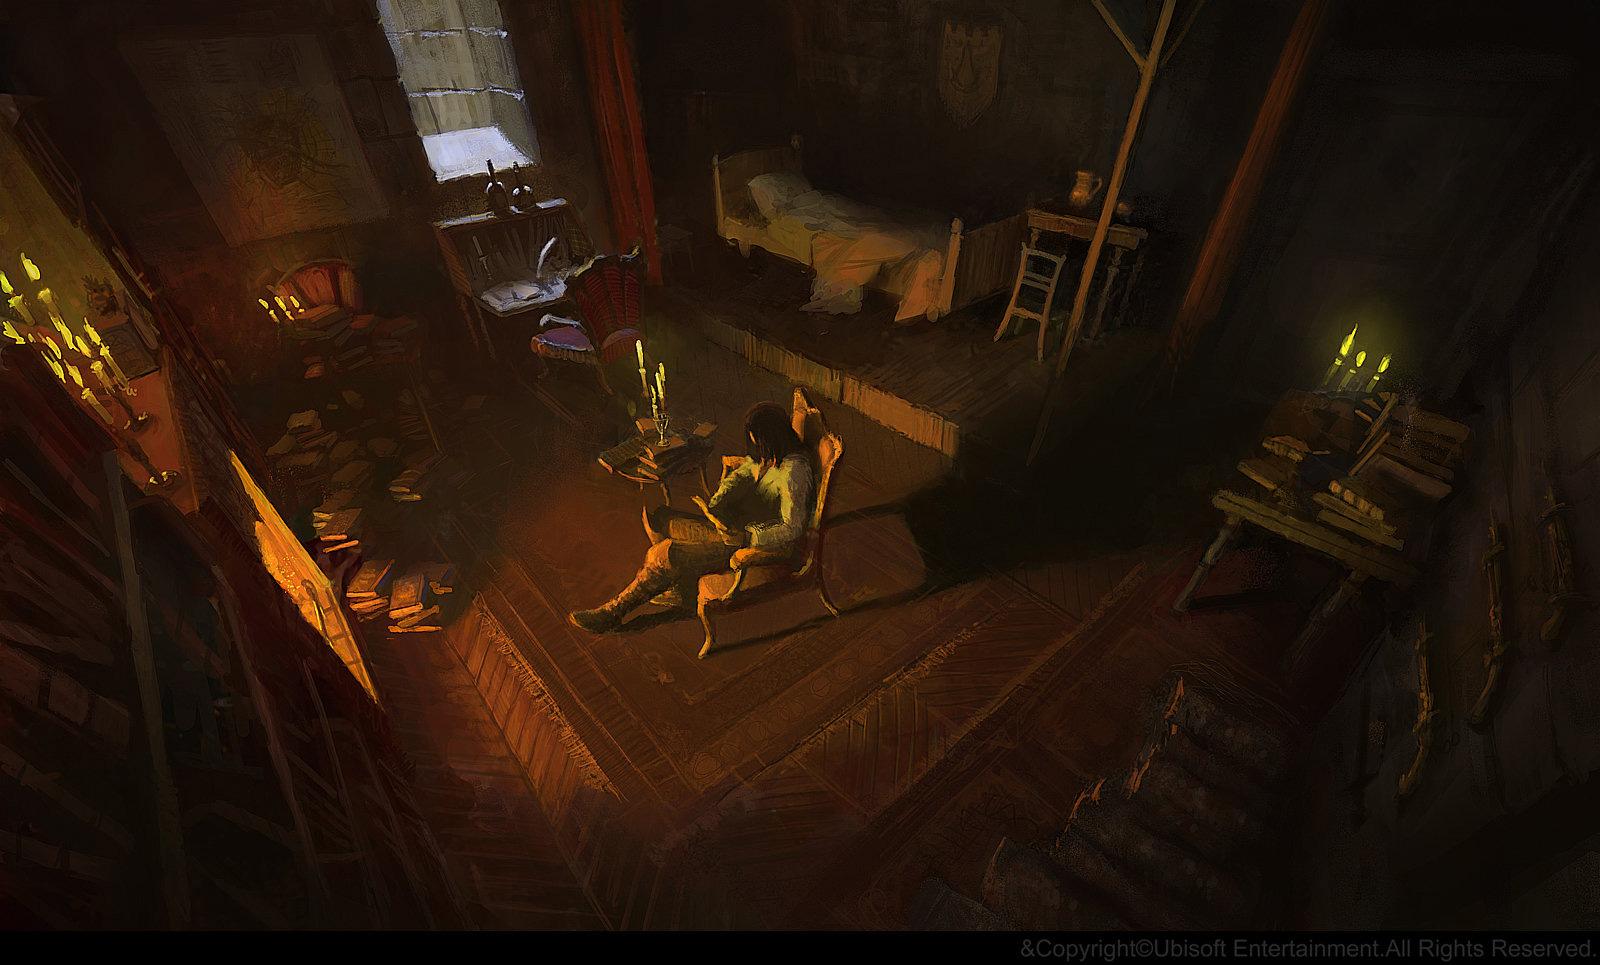 Assassin's Creed Unity Concept Art by Gilles Beloeil